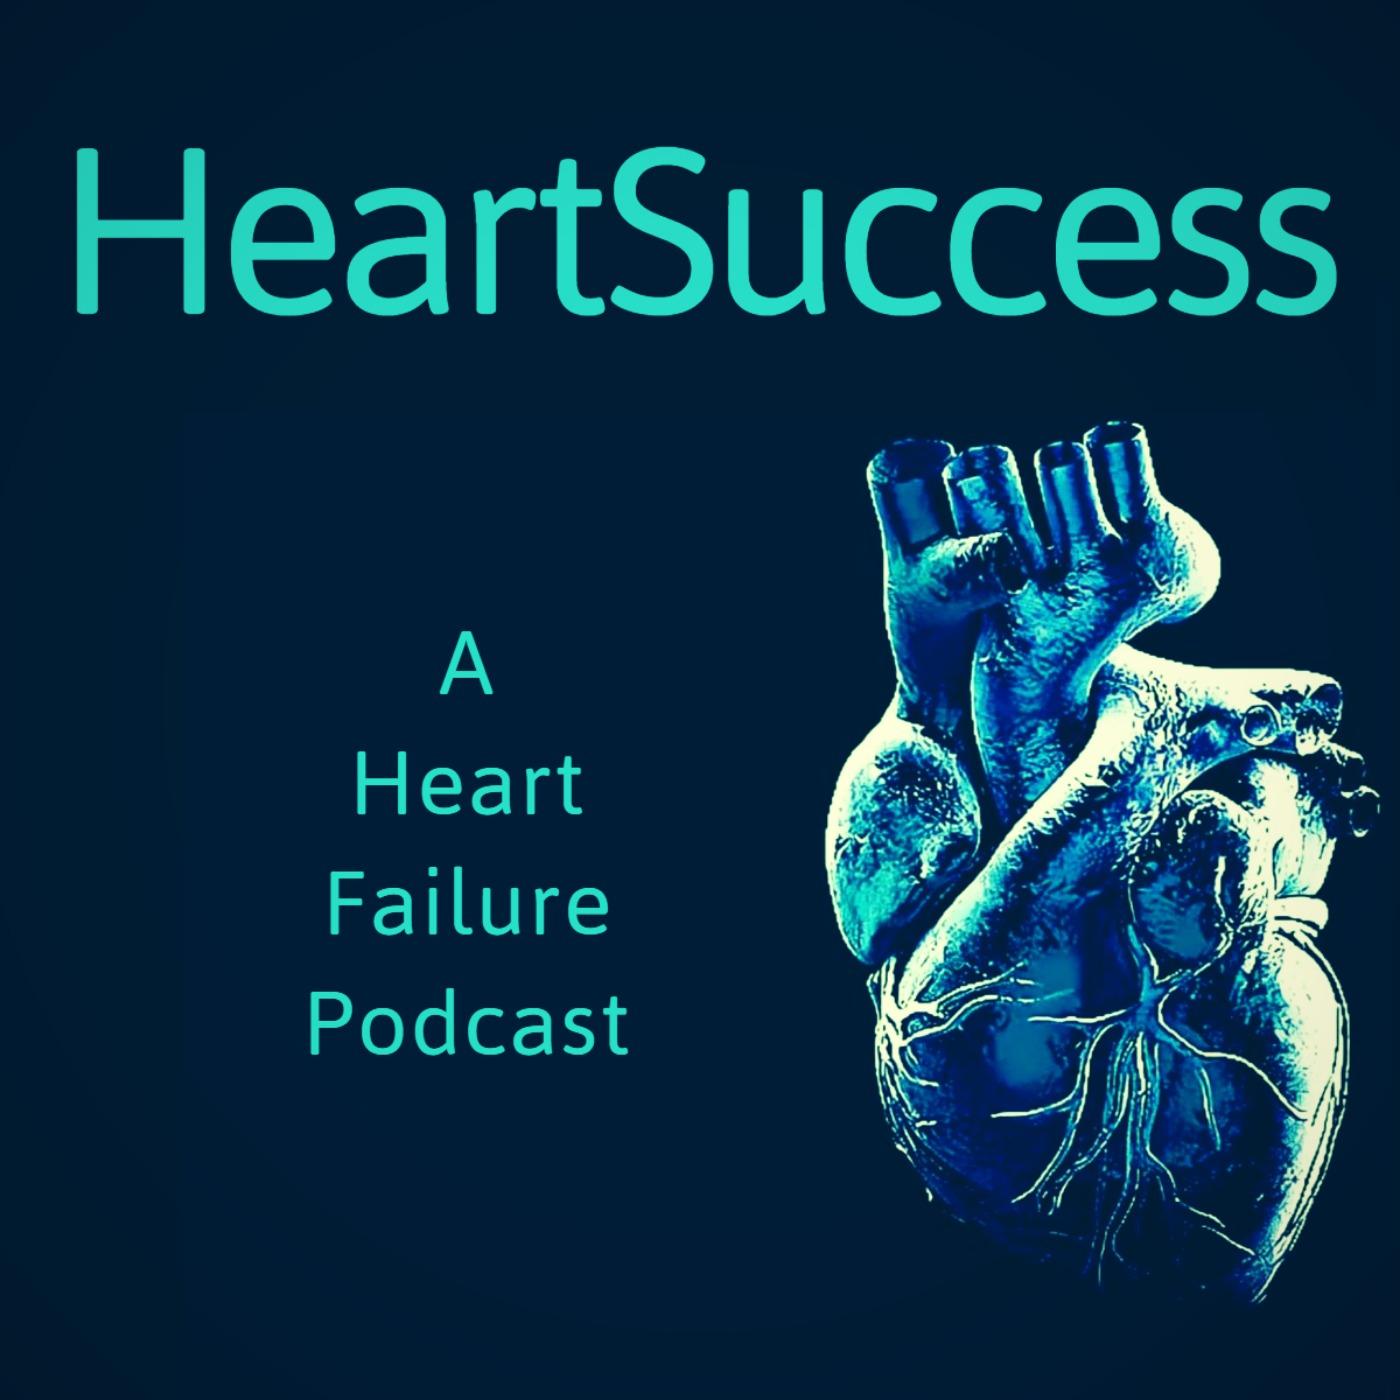 HeartSuccess- A Heart Failure Podcast show art